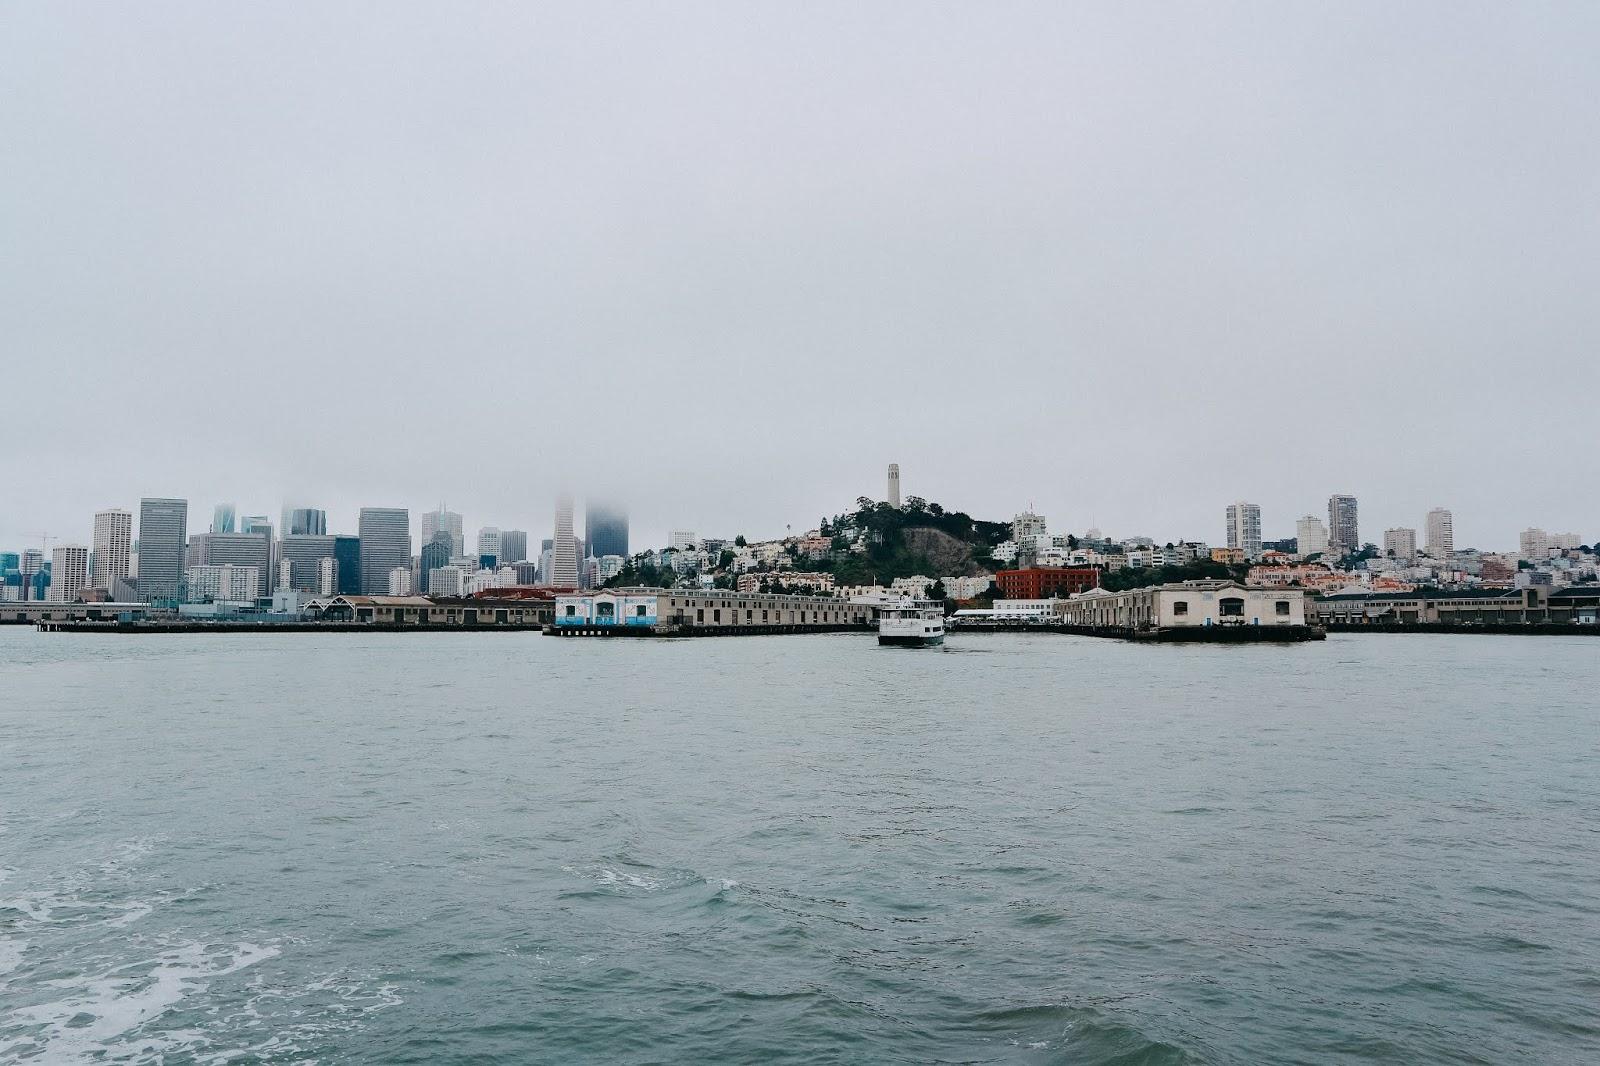 Photographs from San Francisco ItsHollieAnn